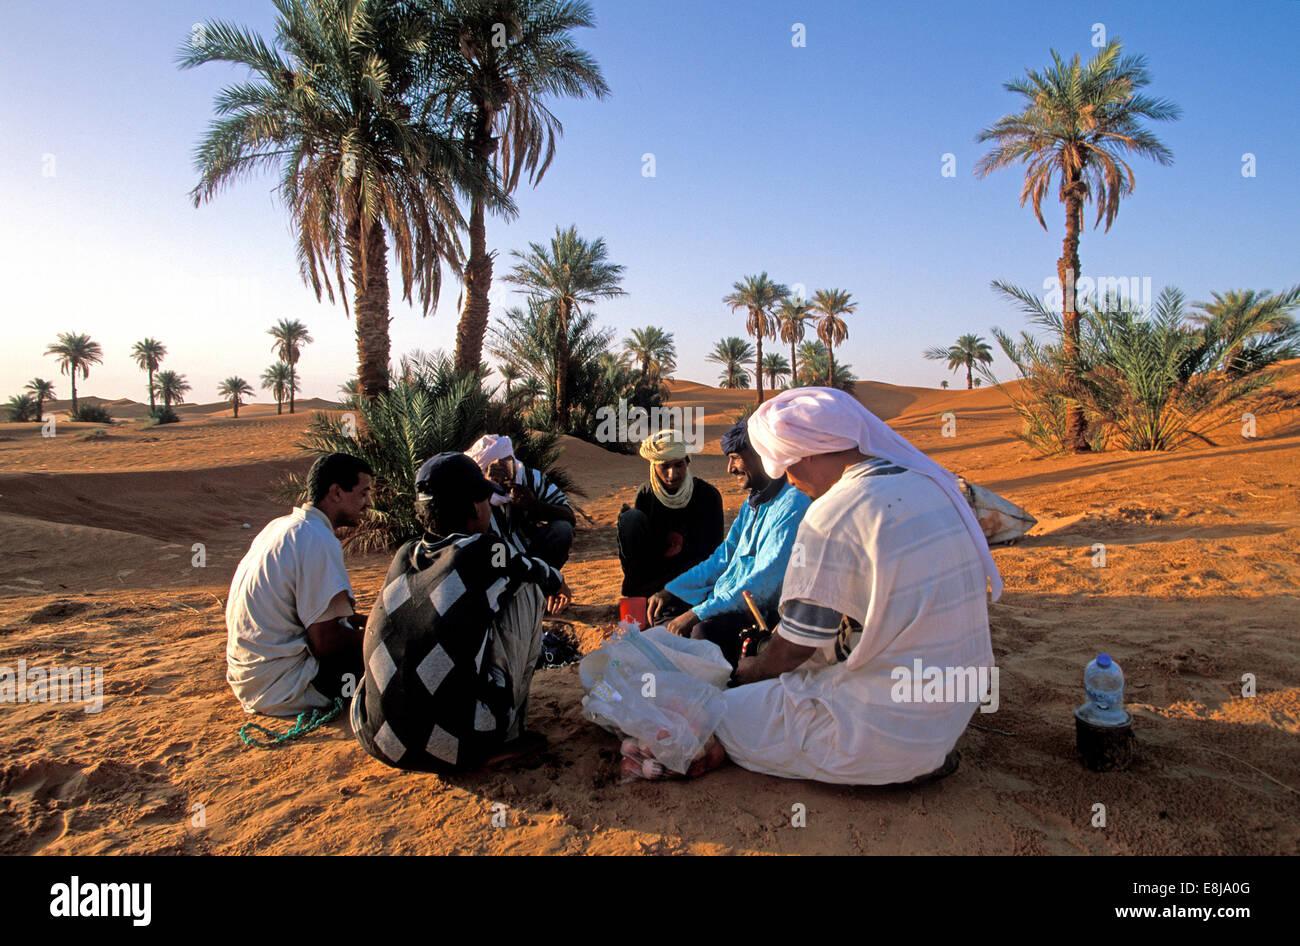 Tuareg population of Timimoun in Algeria. Tea ceremony. - Stock Image